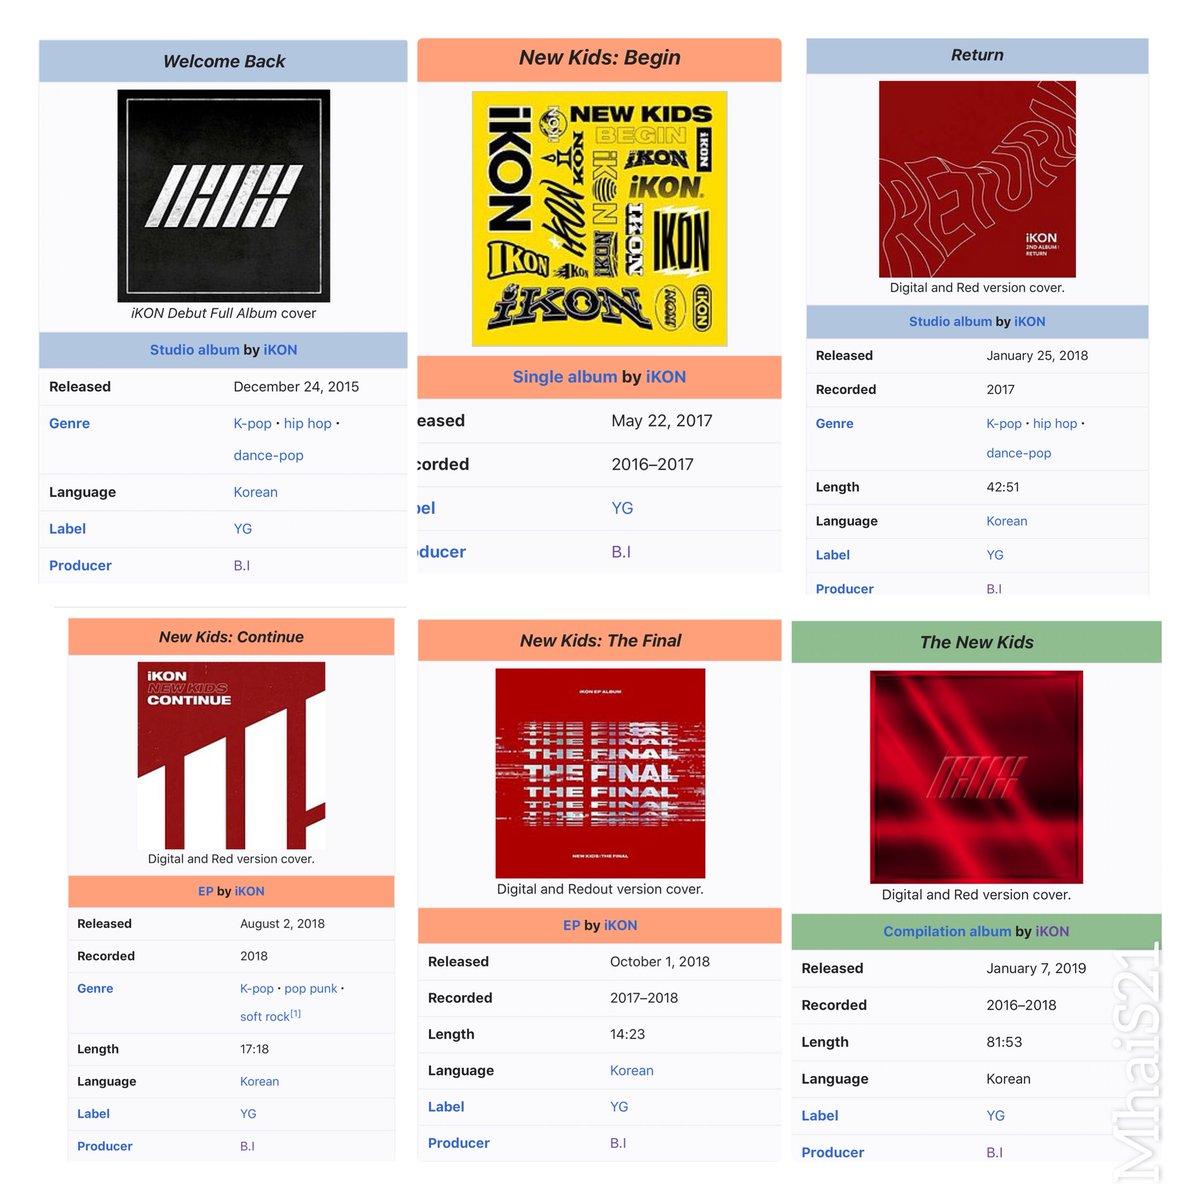 Kim Hanbin. 👇🏻👇🏻👇🏻Welcome Back - B.I, ProducerNew Kids: BEGIN - B.I, ProducerNew Kids: RETURN - B.I, ProducerNew Kids: CONTINUE - B.I, ProducerNew Kids: THE FINAL - B.I, ProducerThe New Kids Repackaged Album - B.I, Producer#AlwaysBIYourSide #FORHANBIN #70GETHERWITHiKON